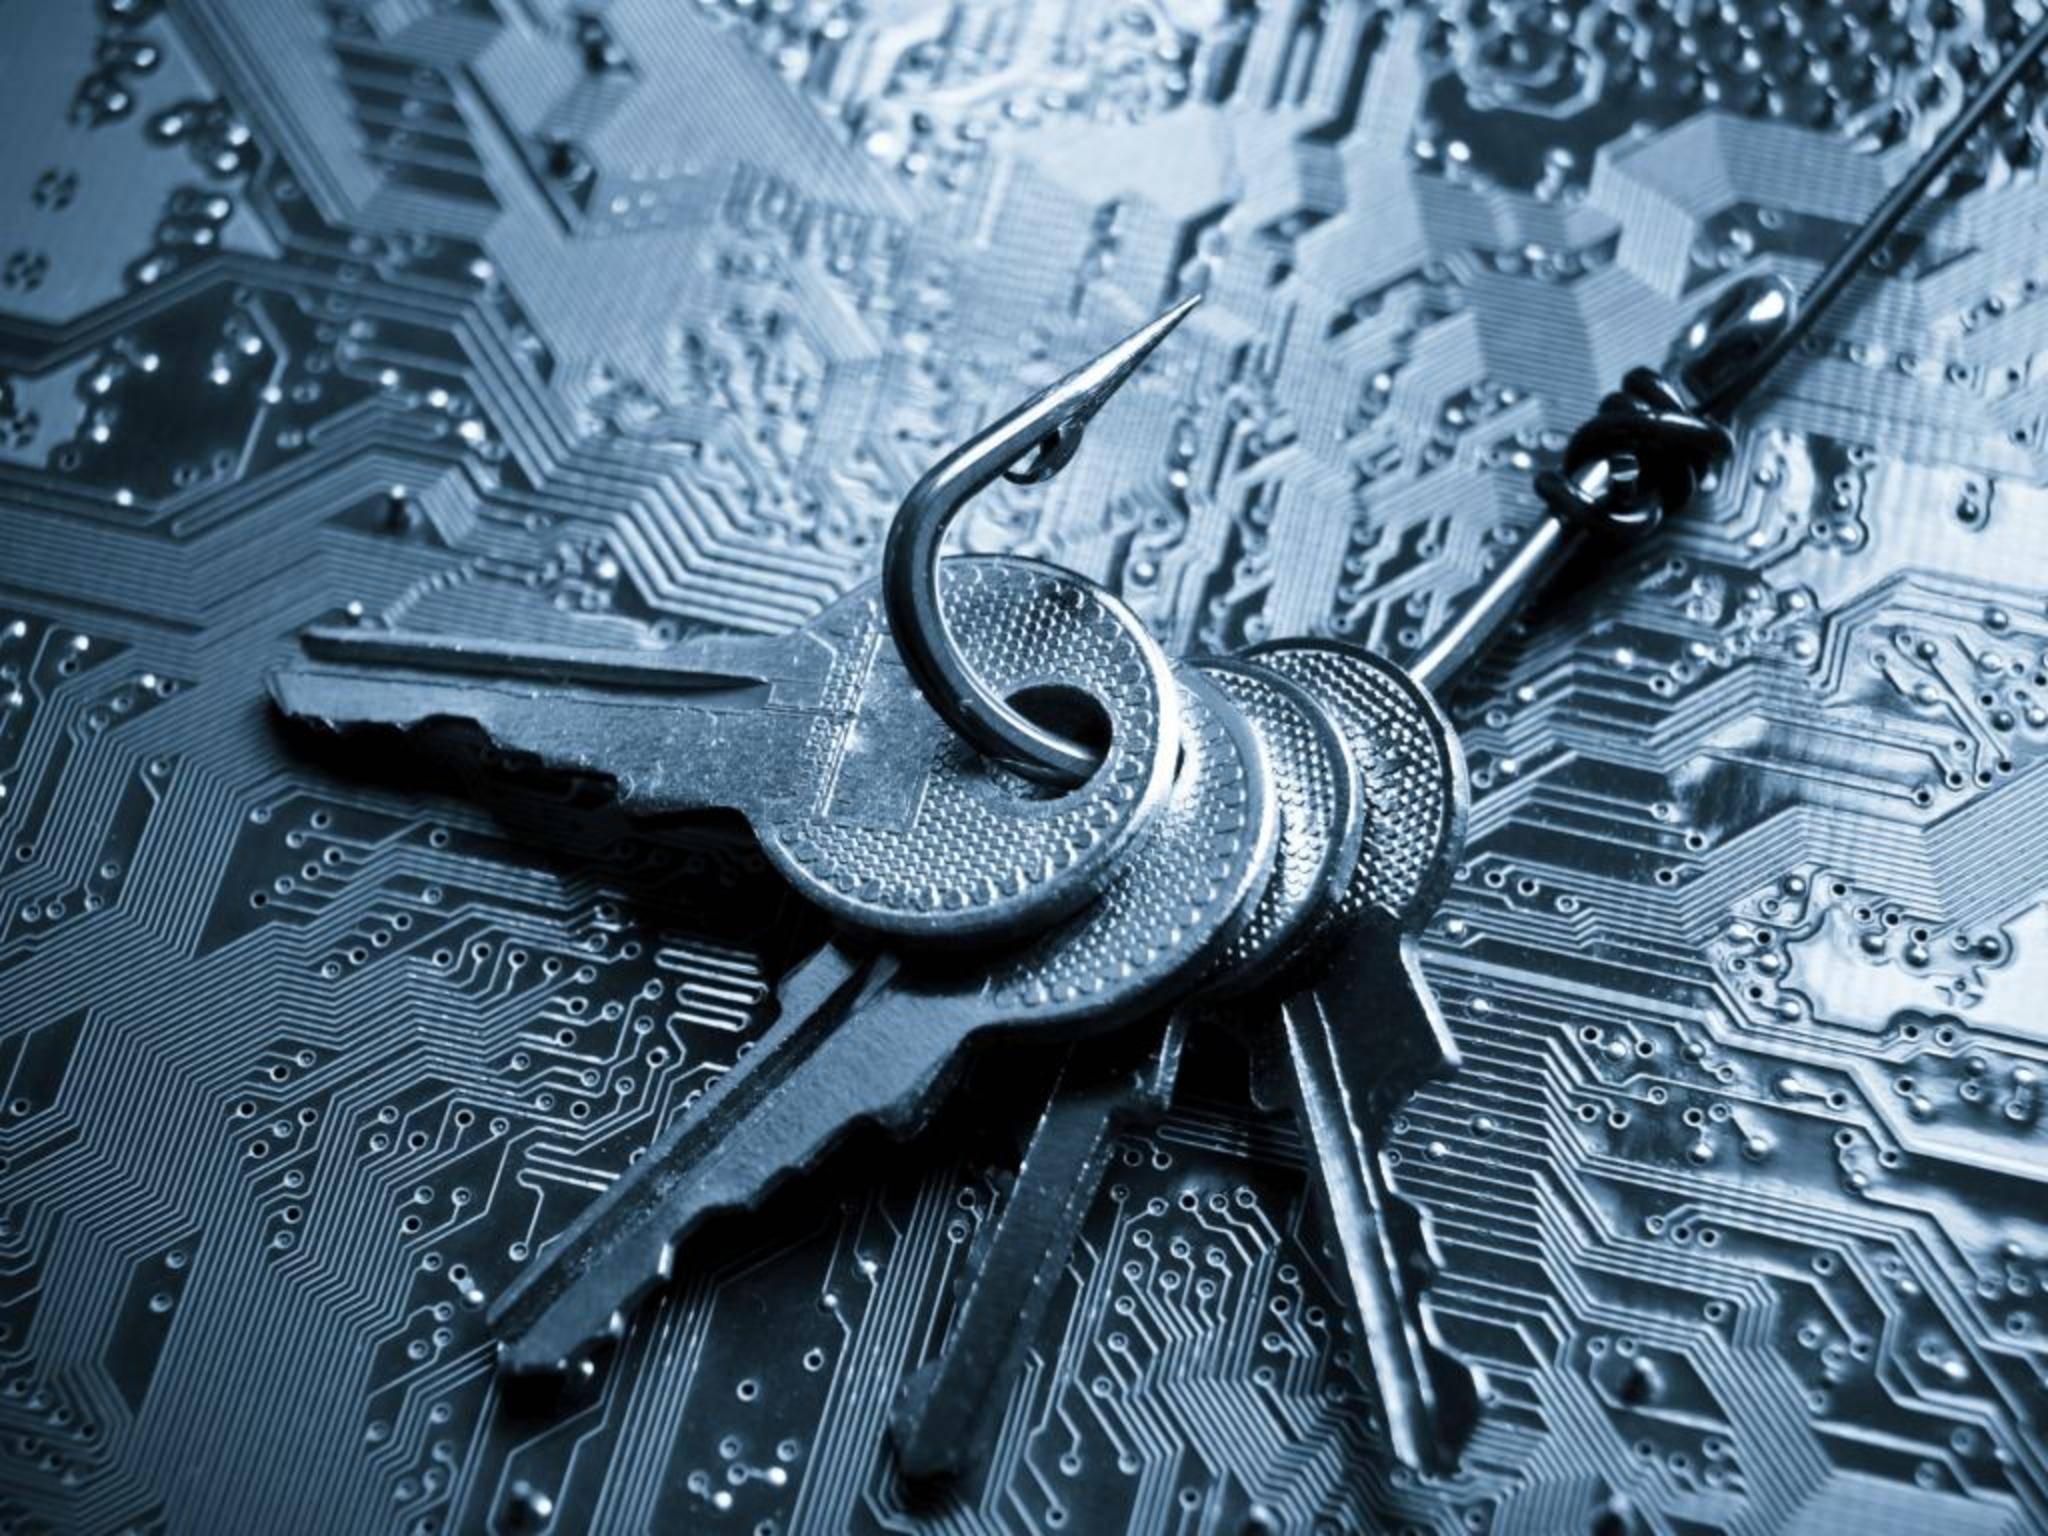 Phishing-Betrüger versuchen, an Passwörter, PINs und Co. zu kommen.